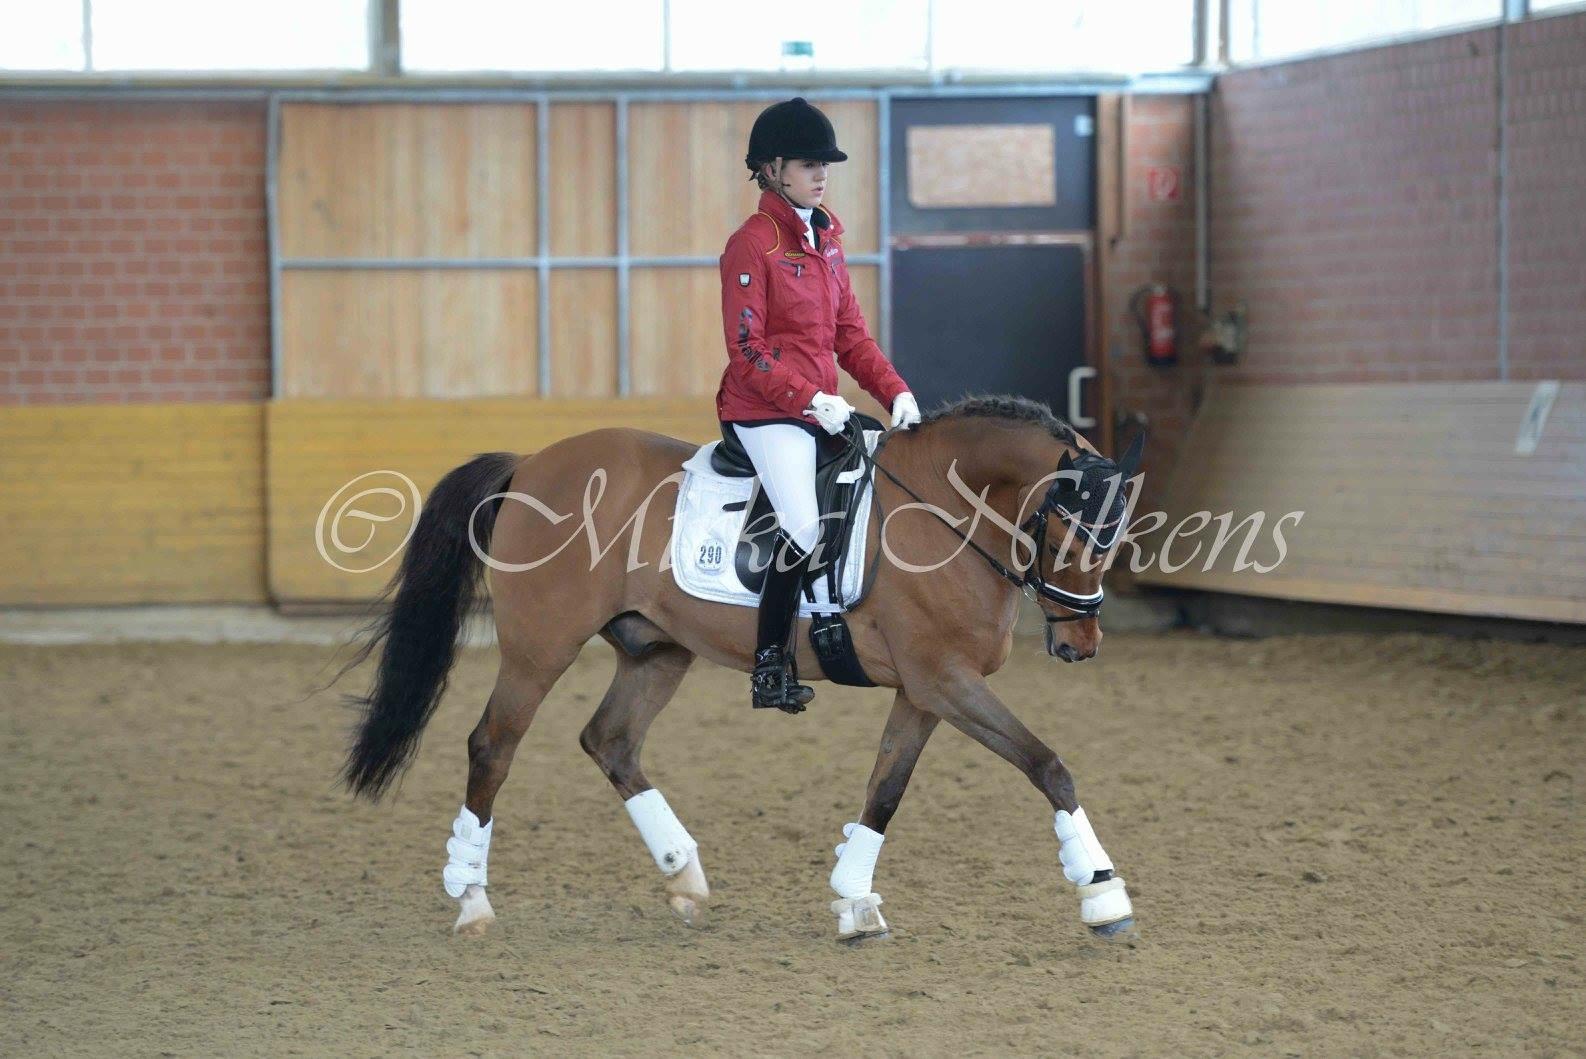 Ponyturnier Hamminkeln